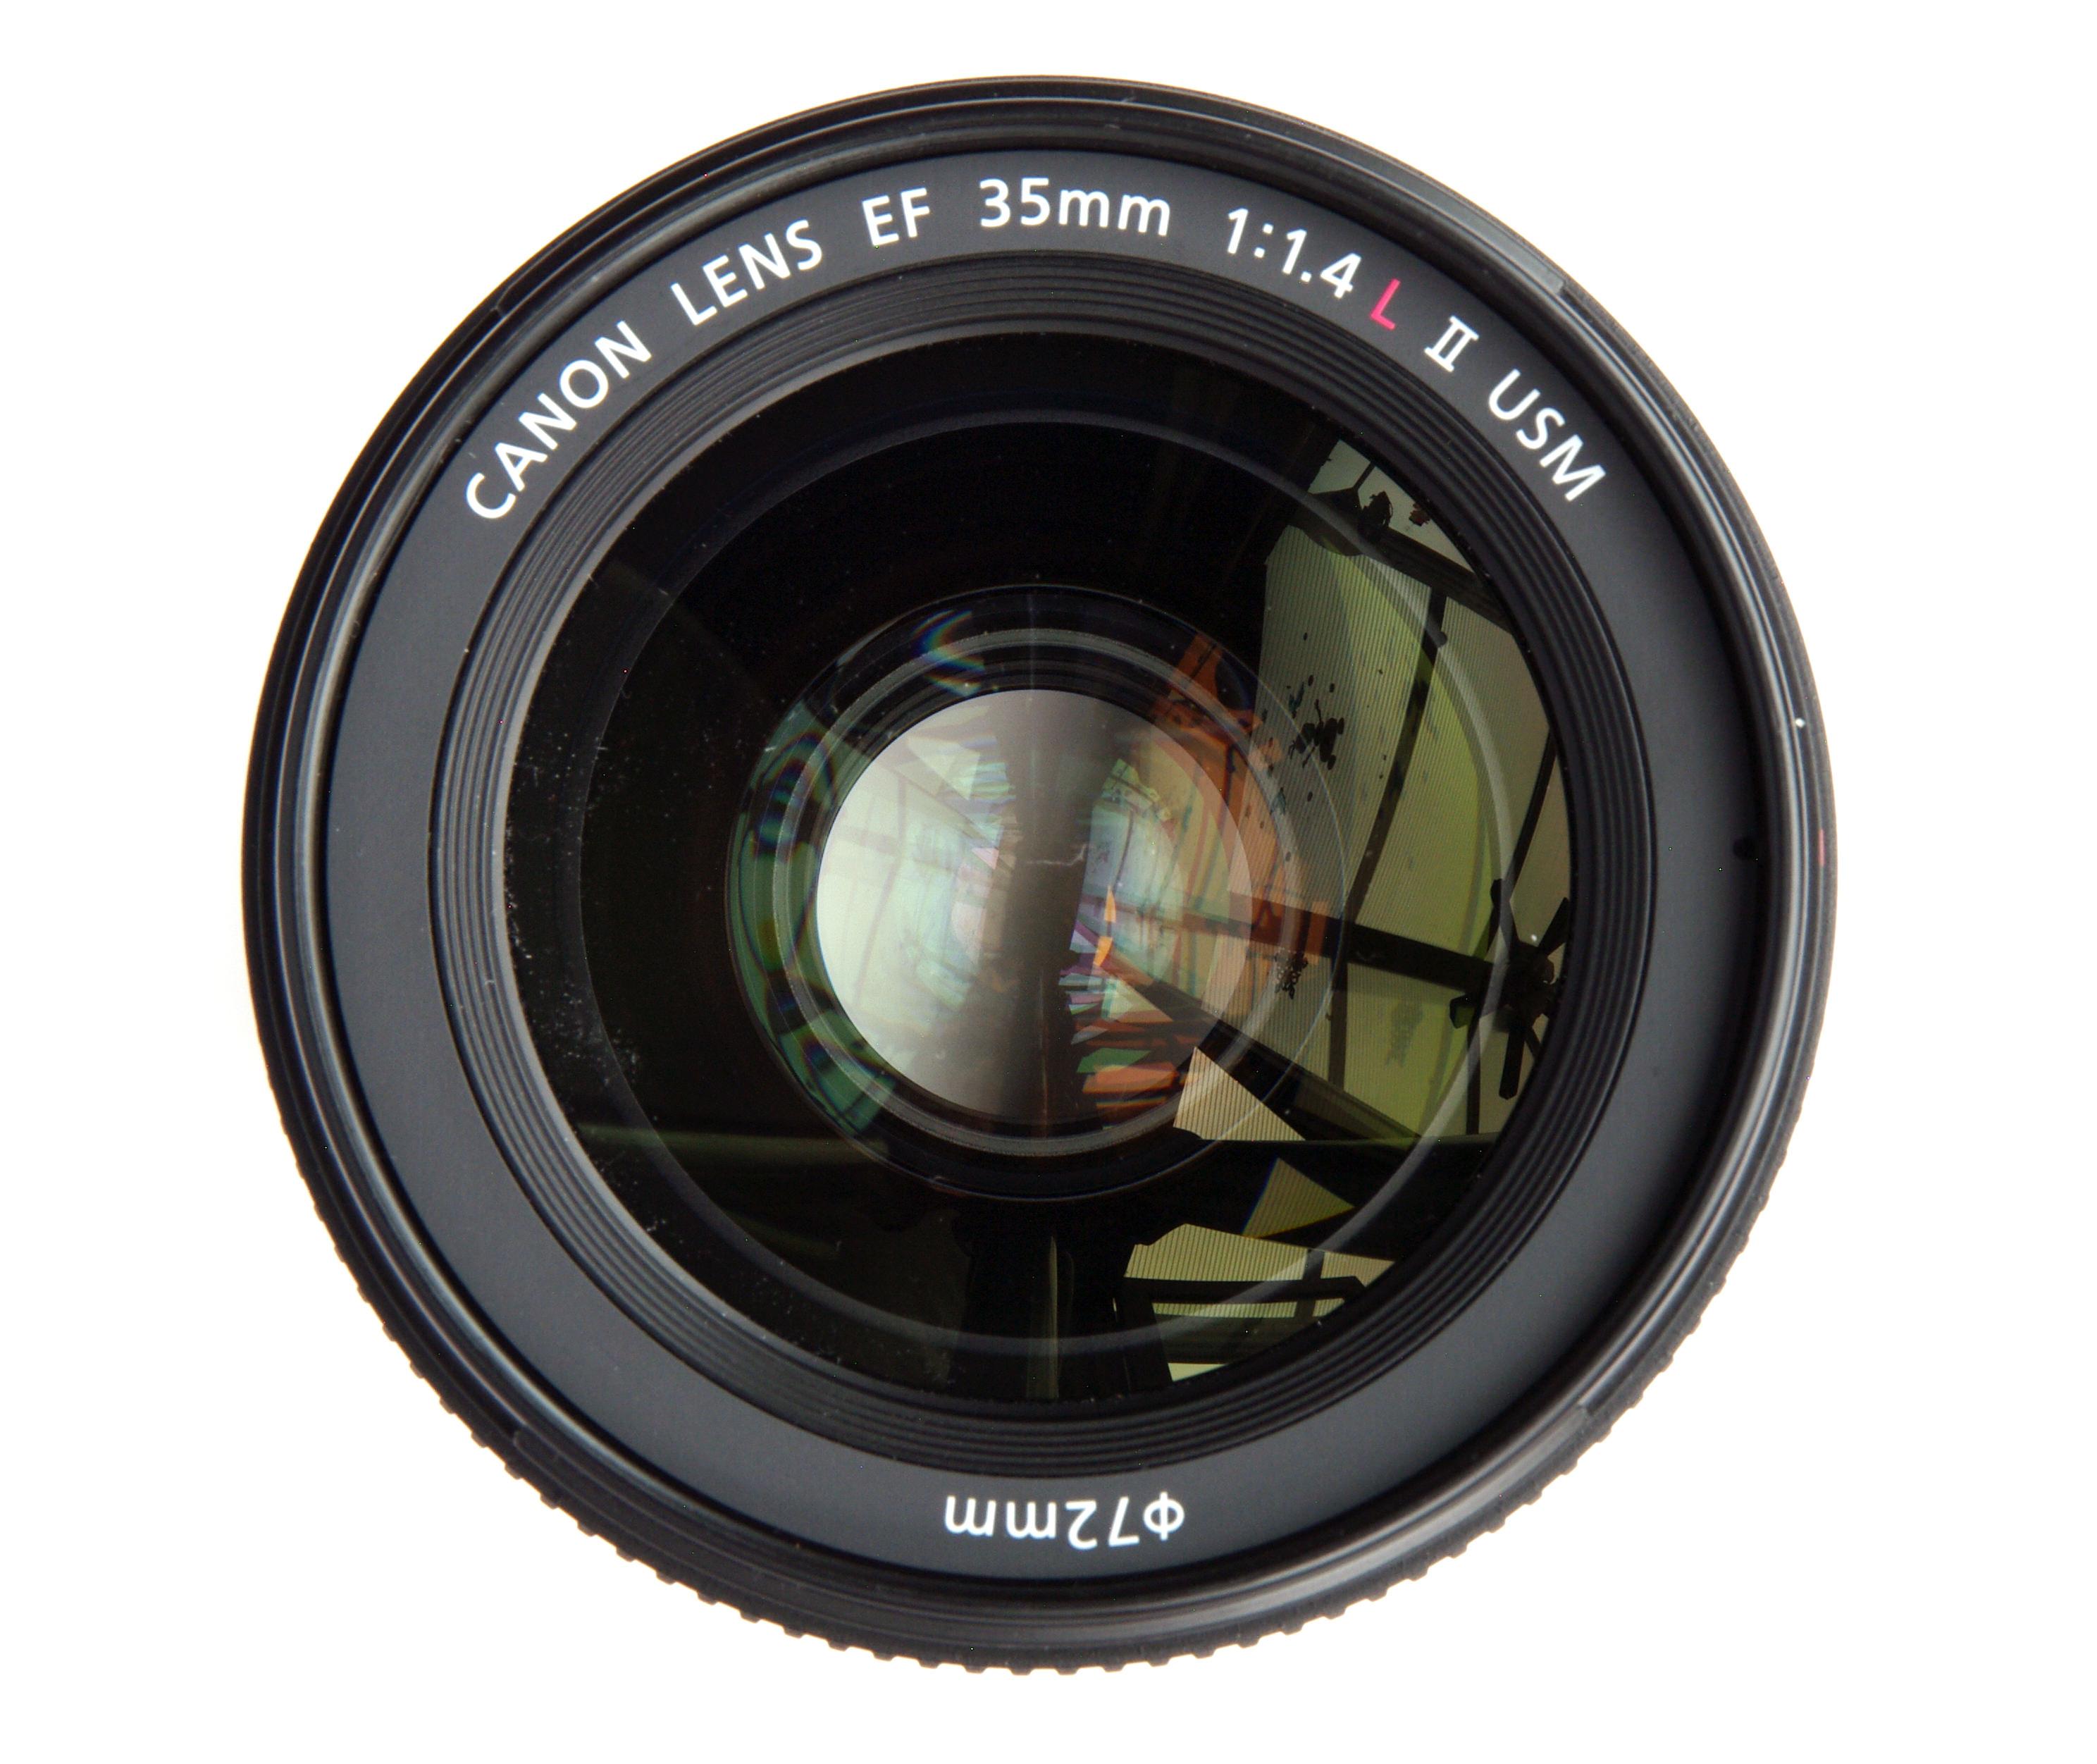 Canon EF 35mm f/1.4L II USM Lens Review | ePHOTOzine